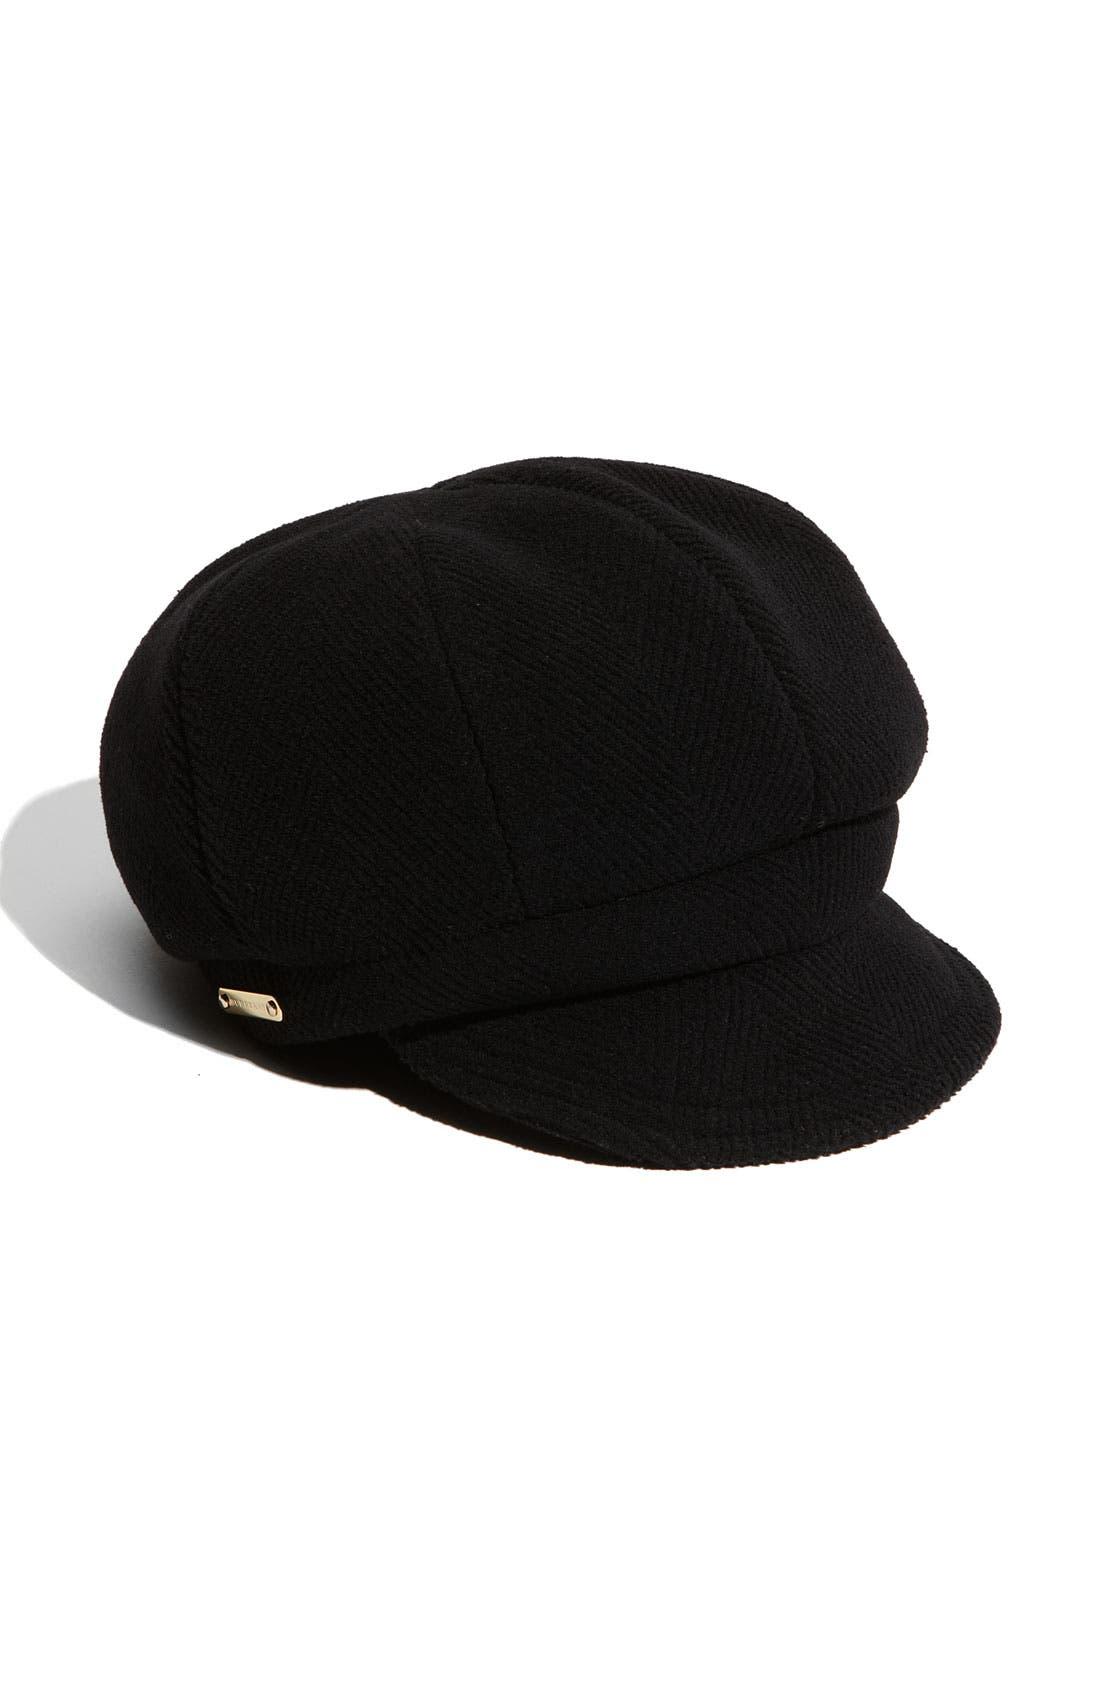 Wool Duffle Cap, Main, color, 001